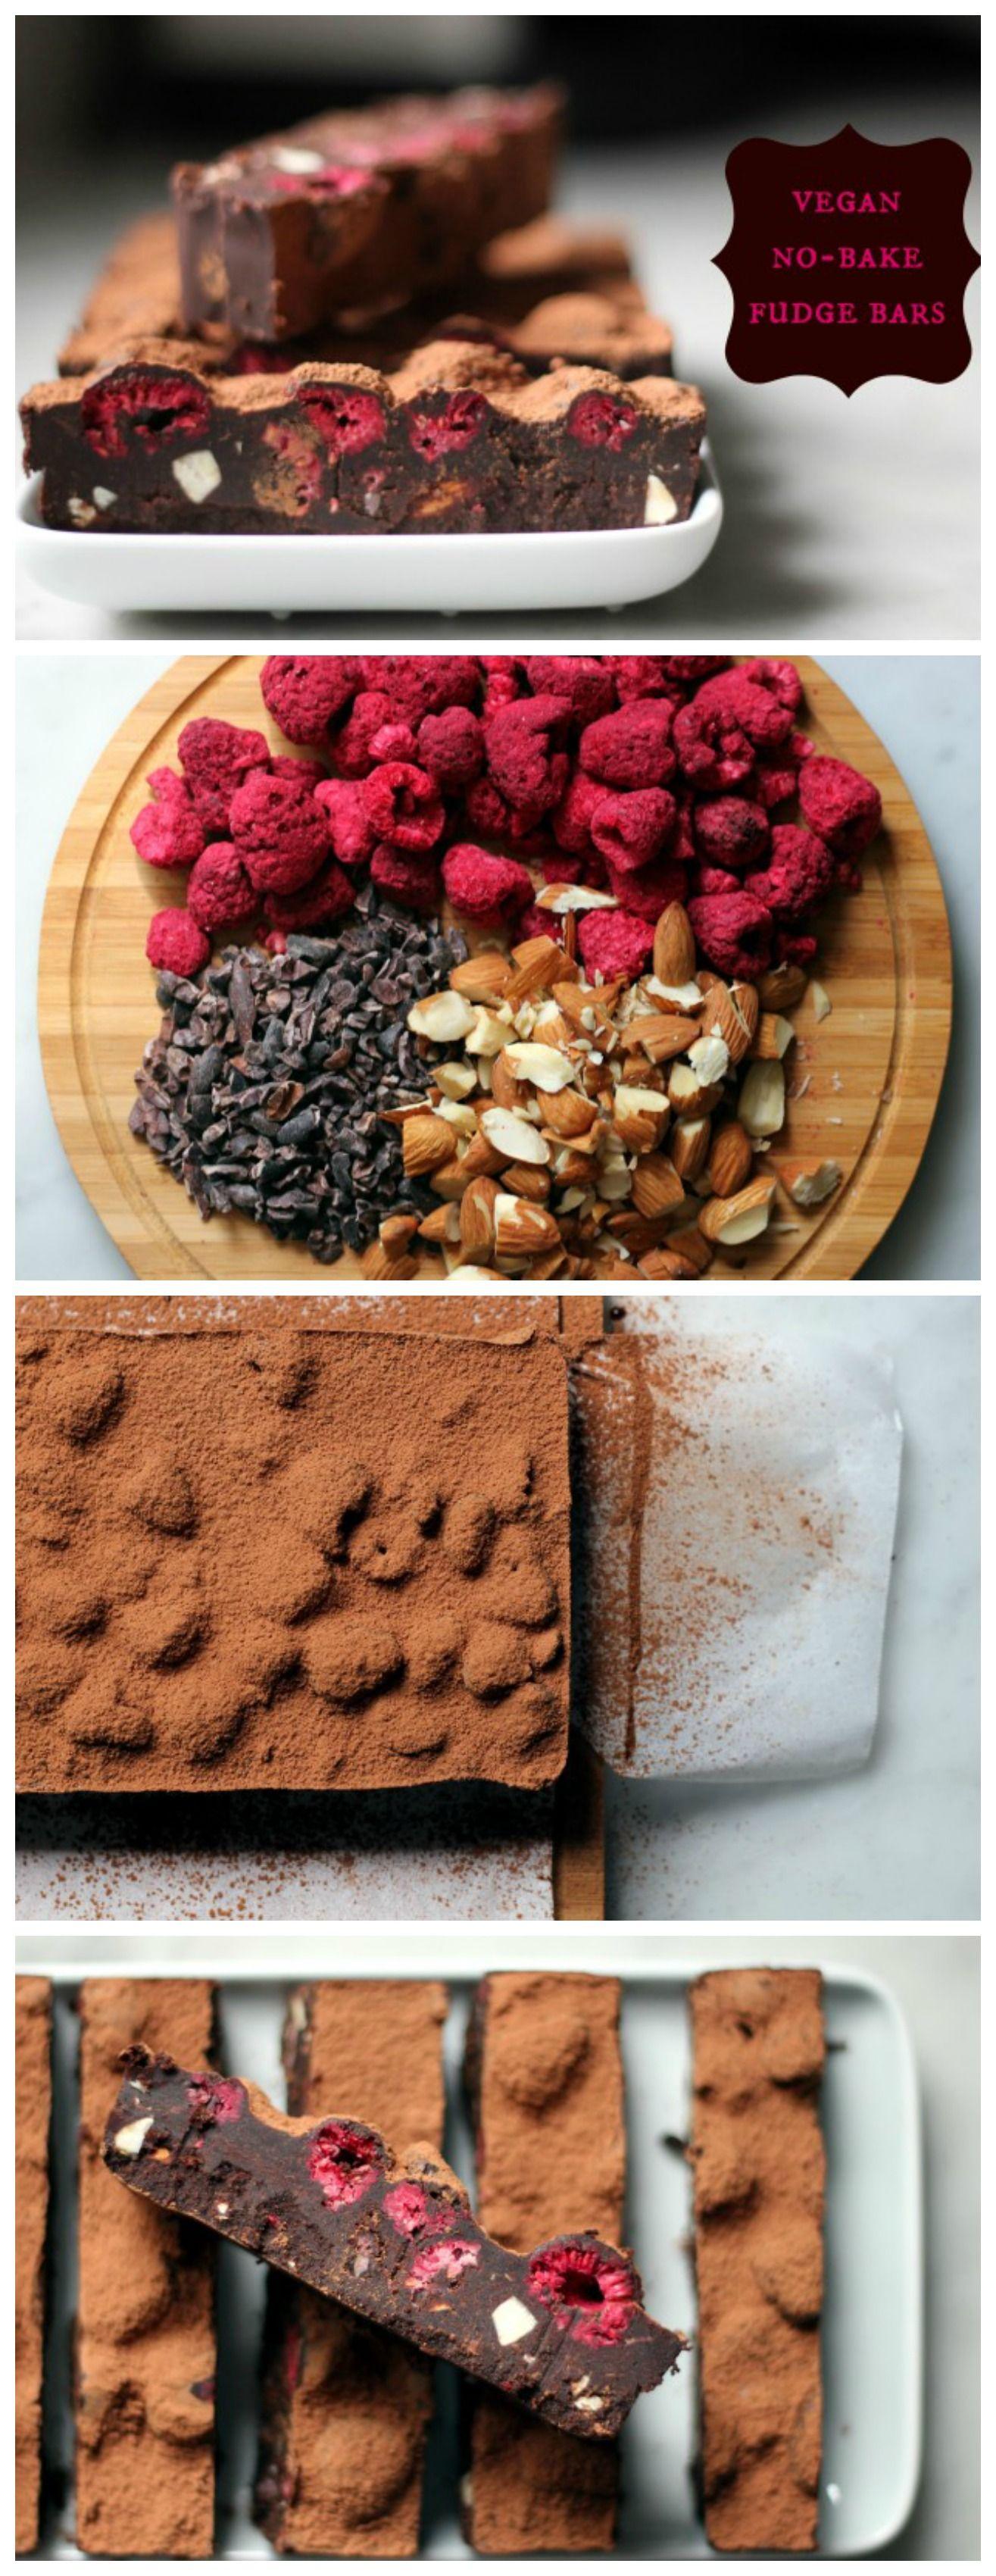 These no-bake, vegan, gluten-free fudge bars are delicious!